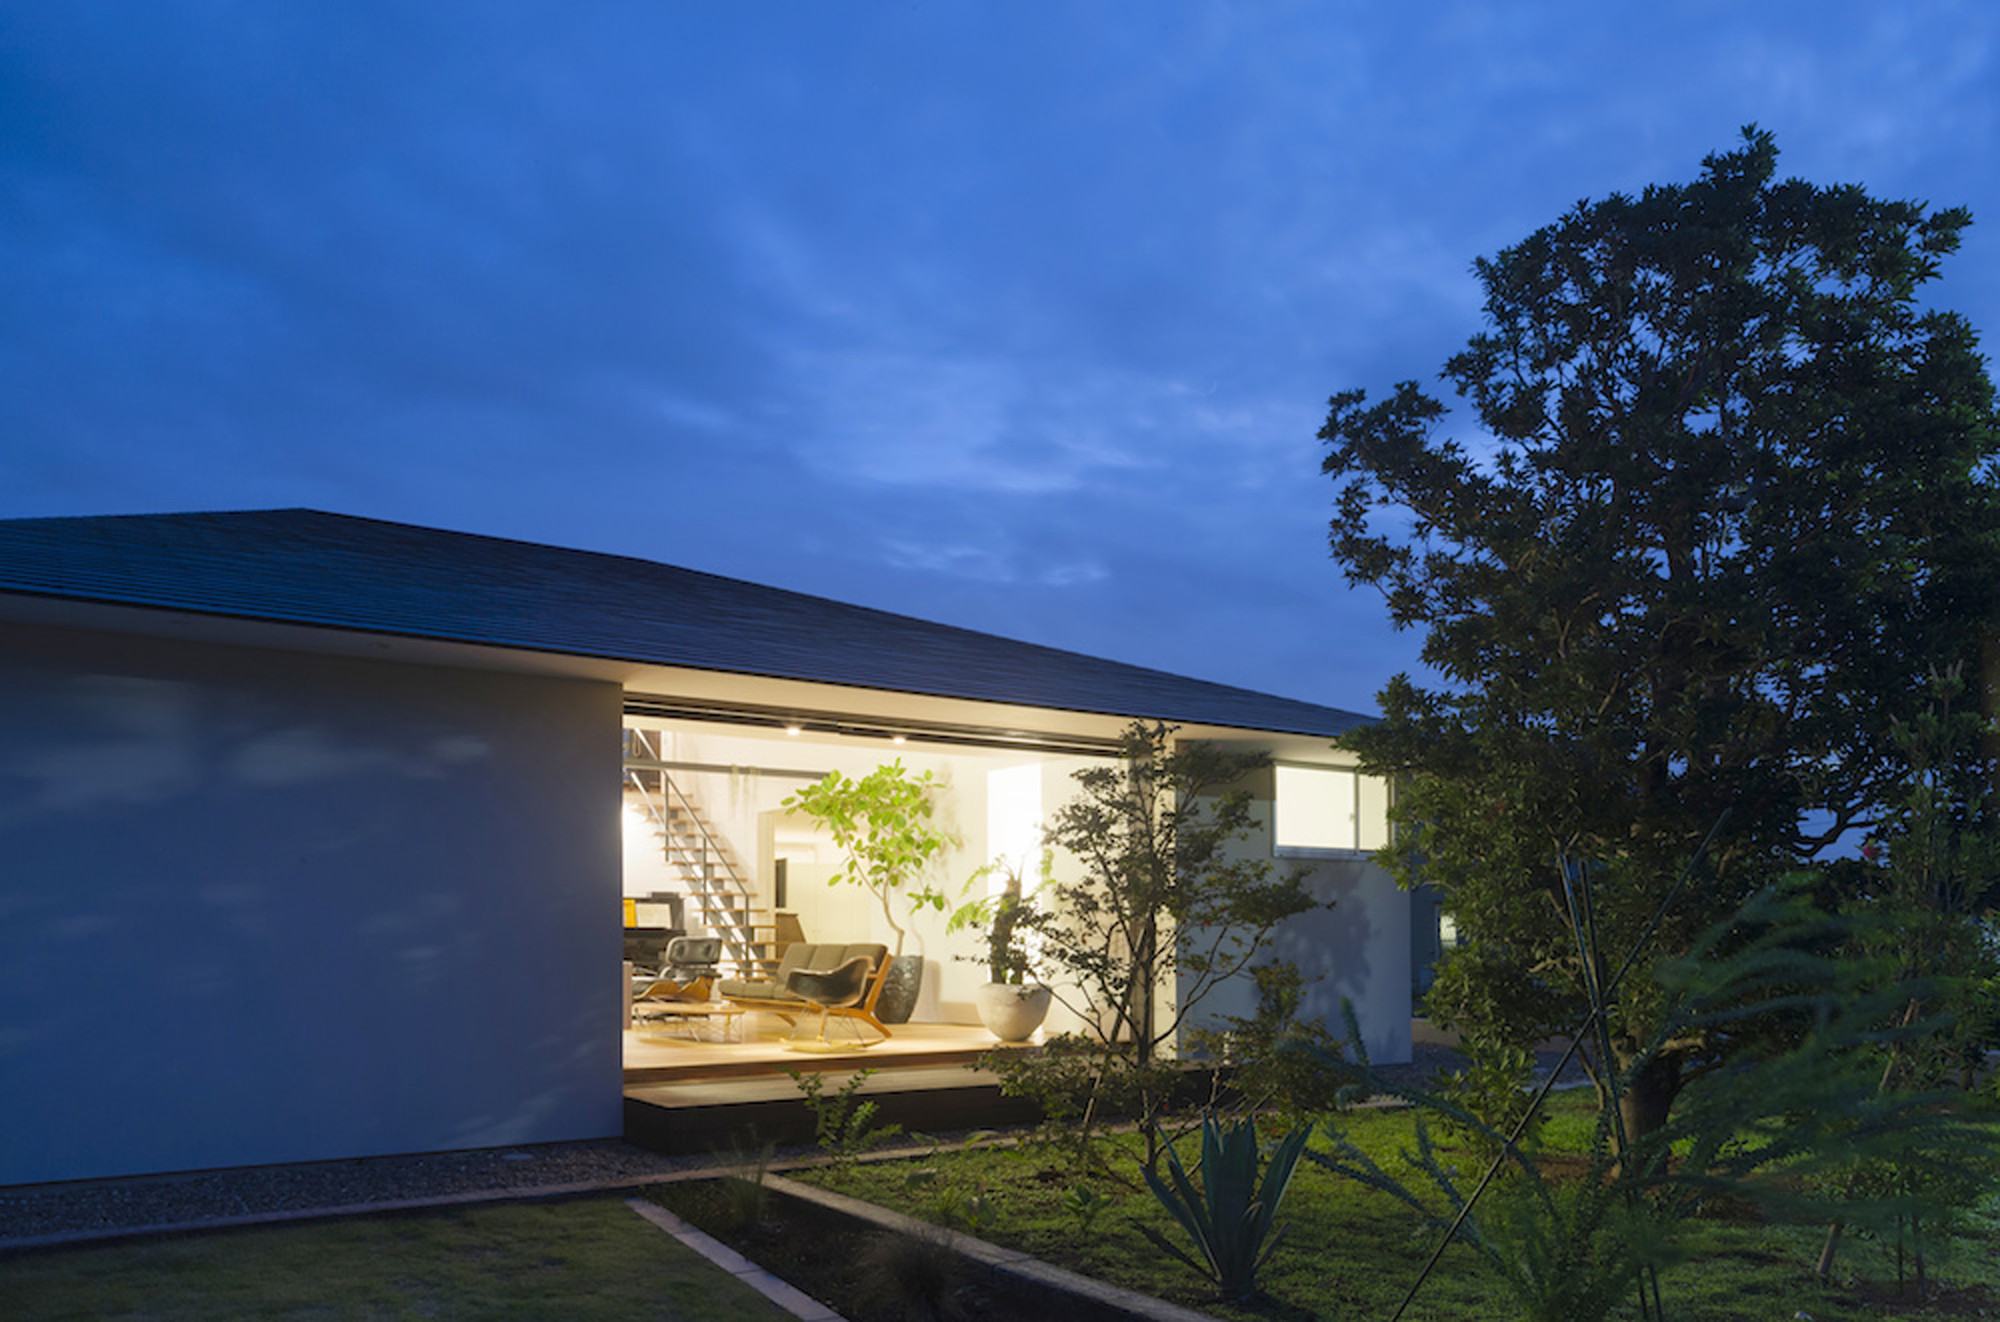 Galer a de casa de largo techo a cuatro aguas naoi for Casas techos cuatro aguas